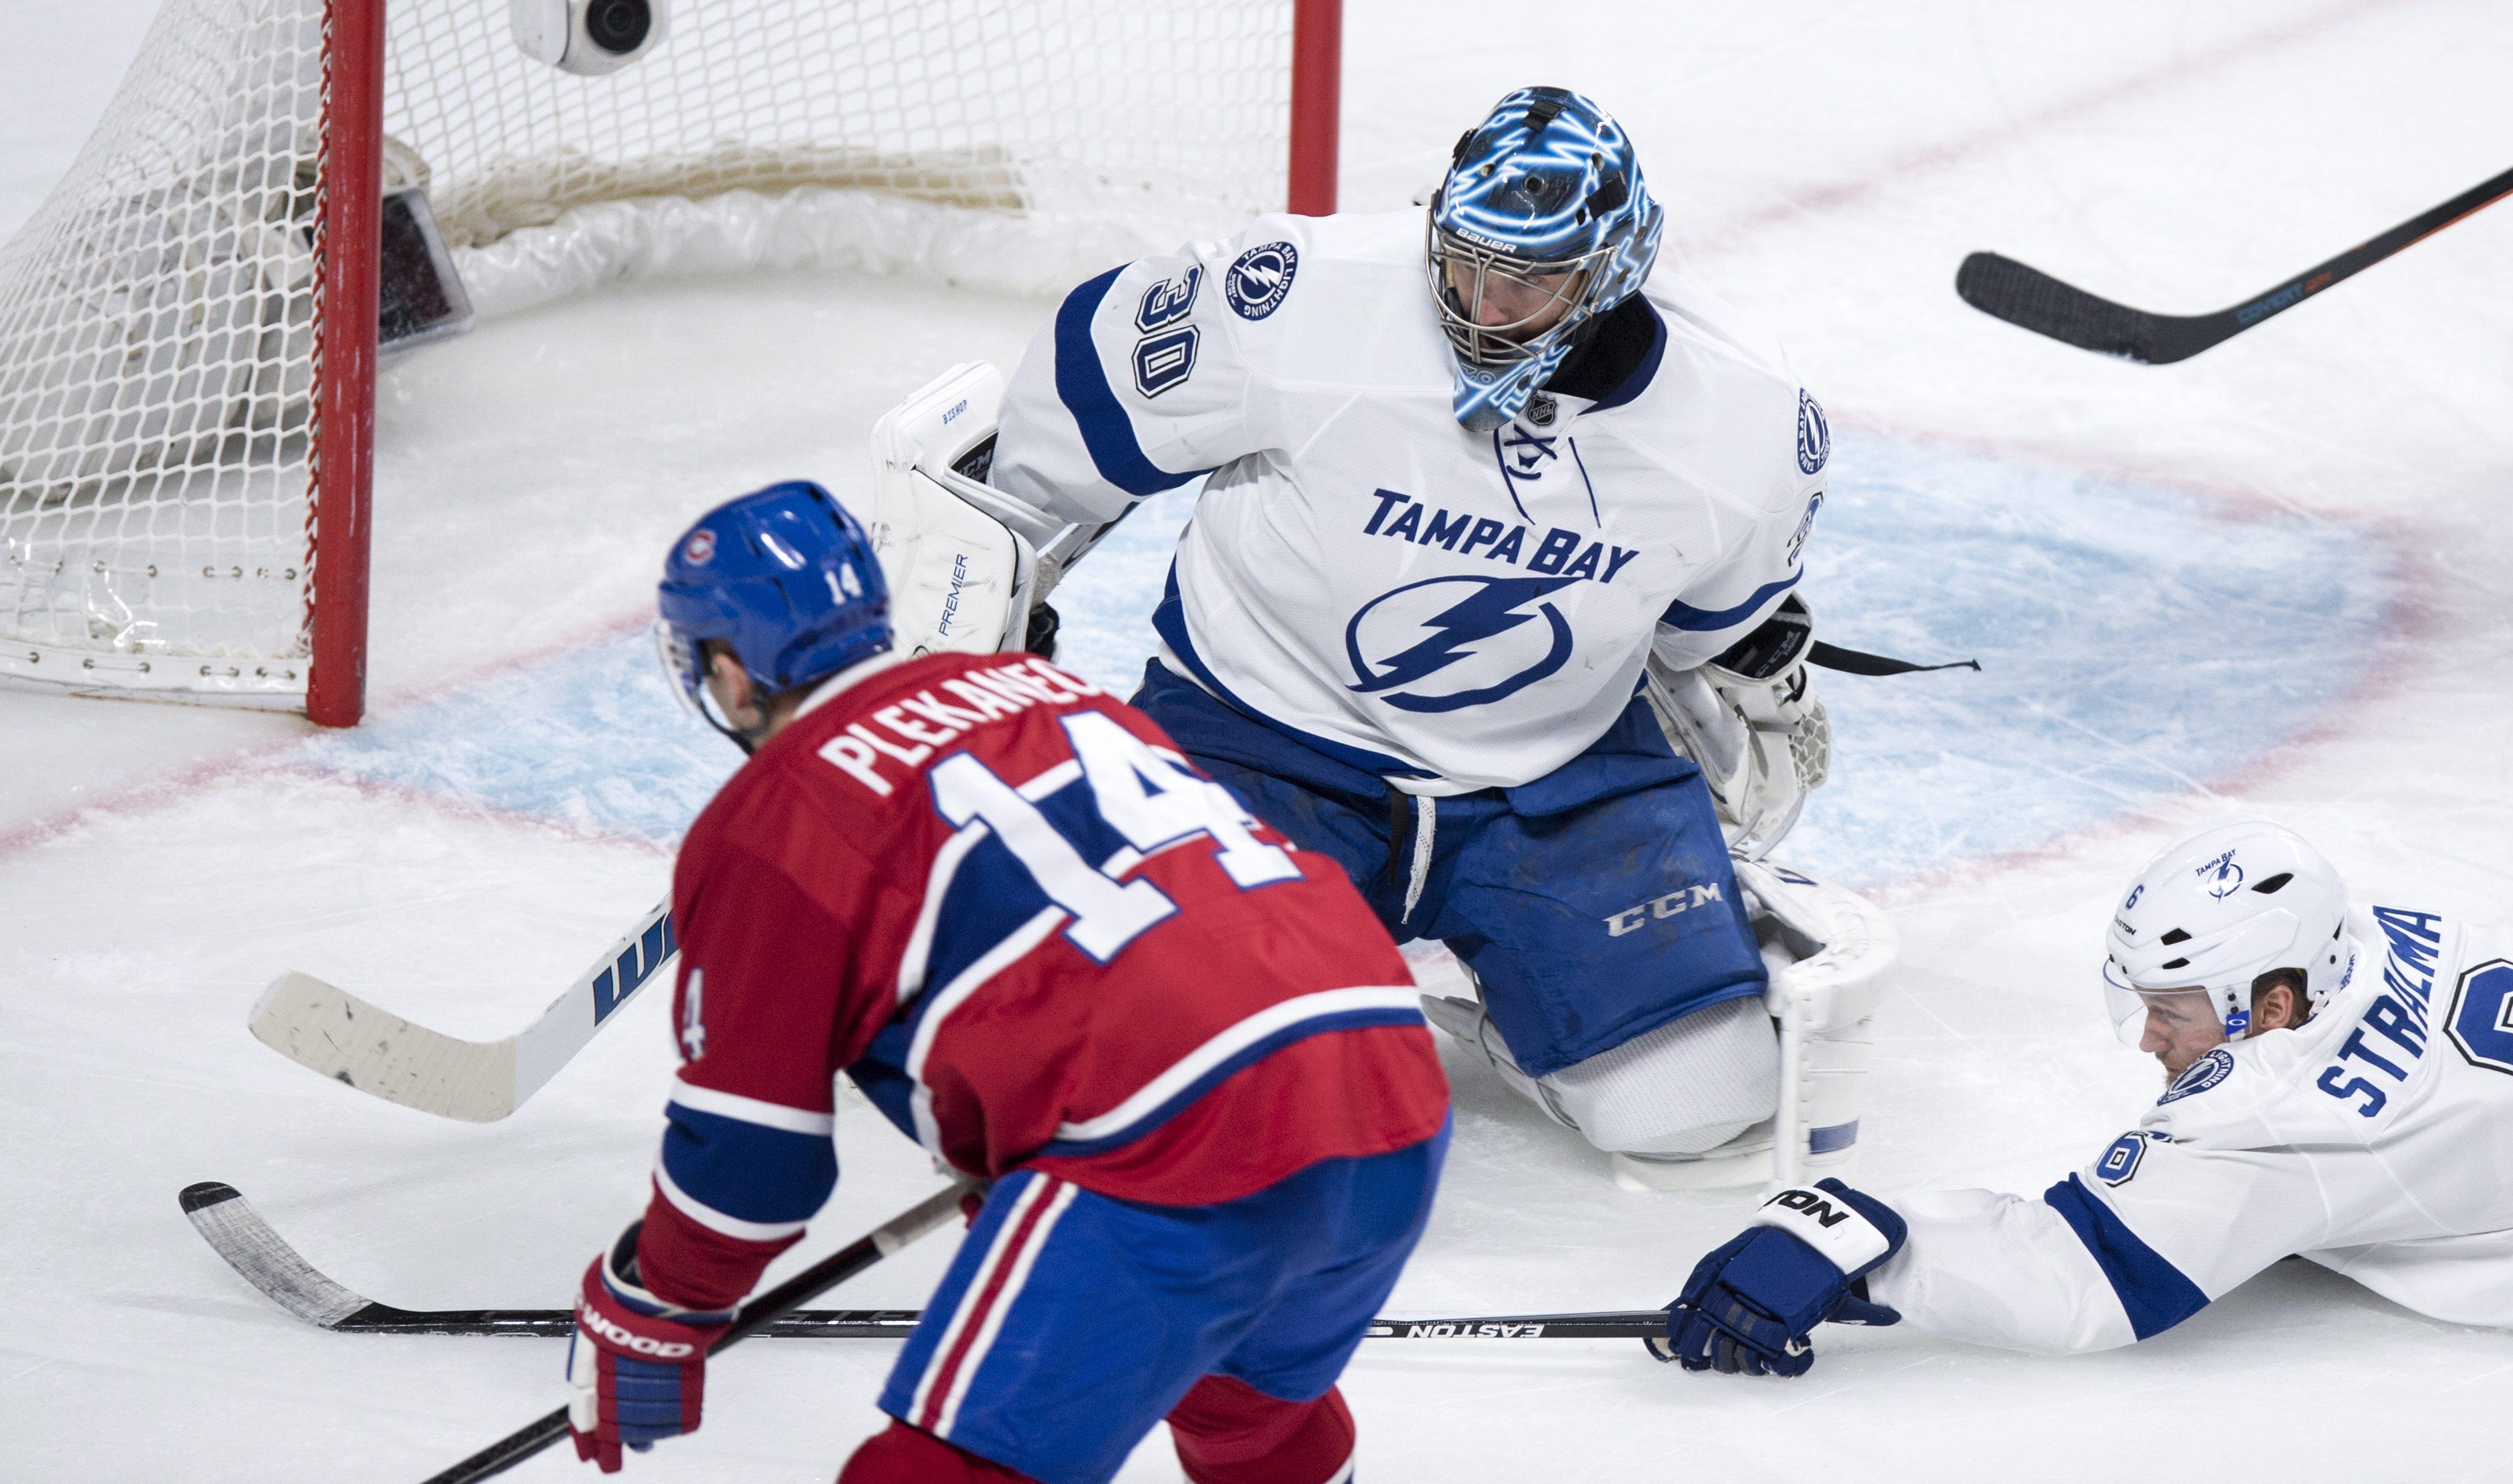 Lightning_canadiens_hockey